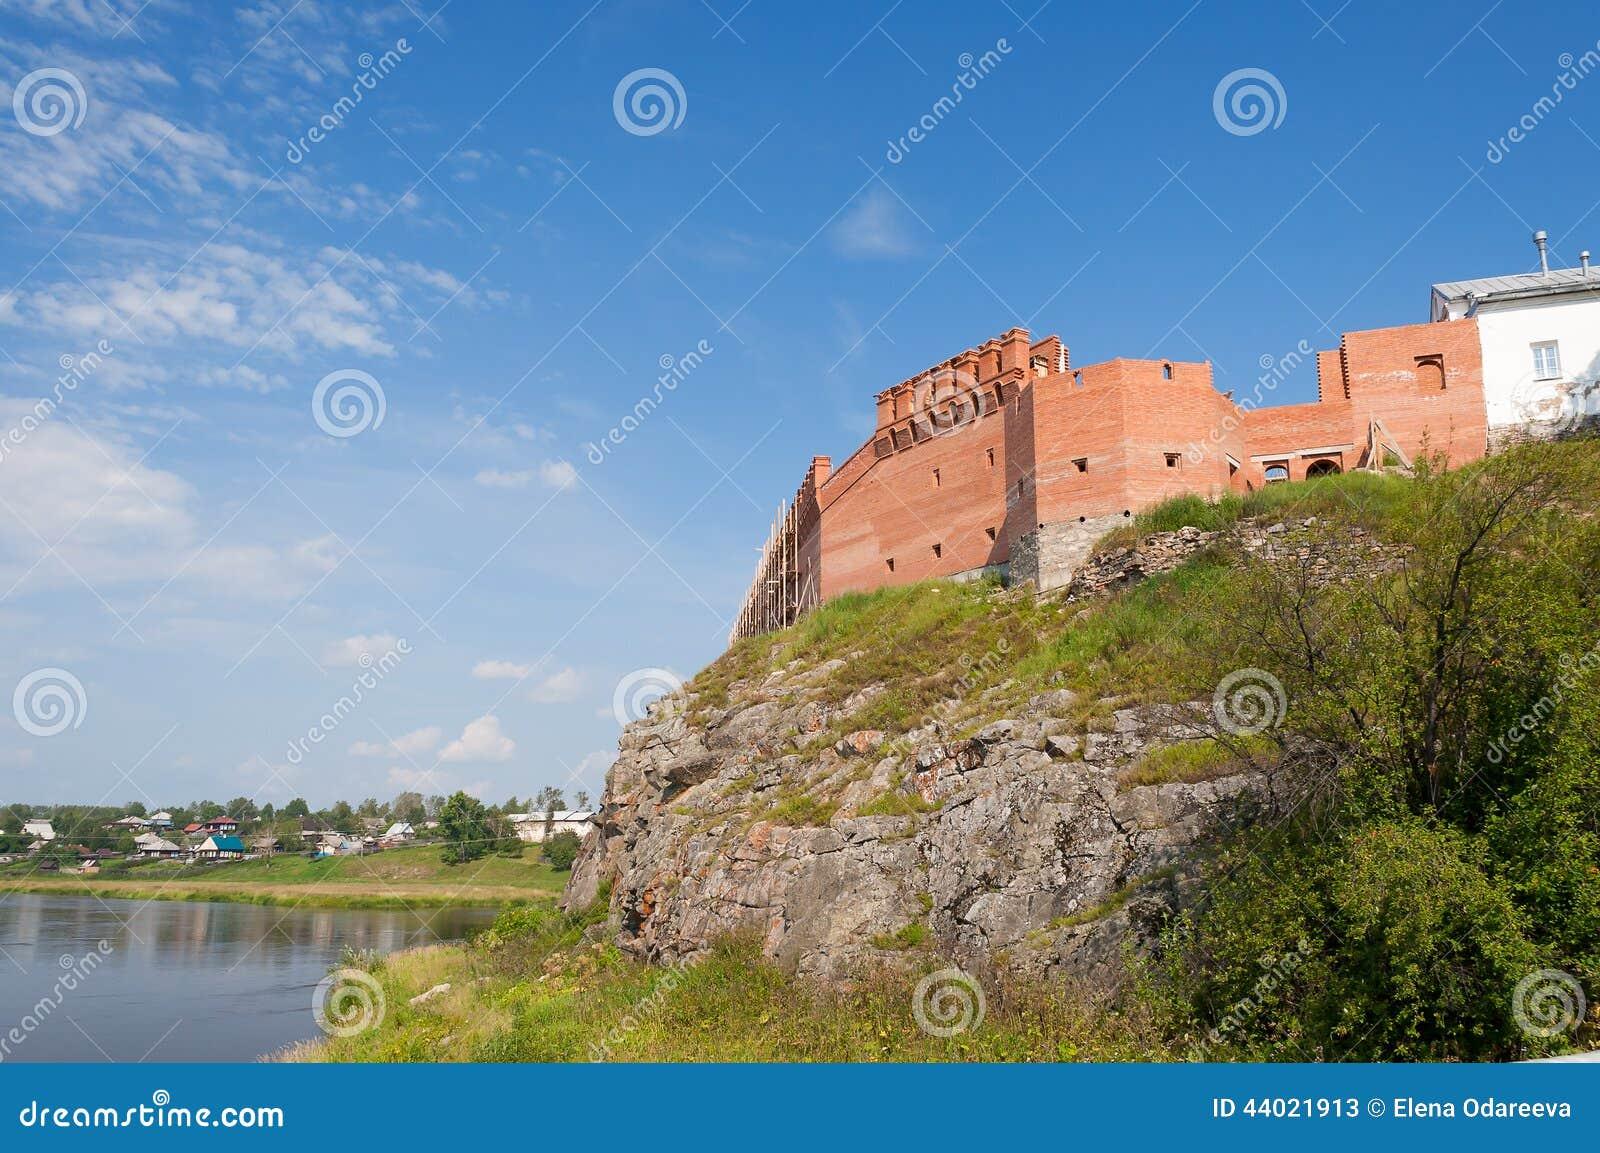 Kremlin sur les banques de la rivière Tura